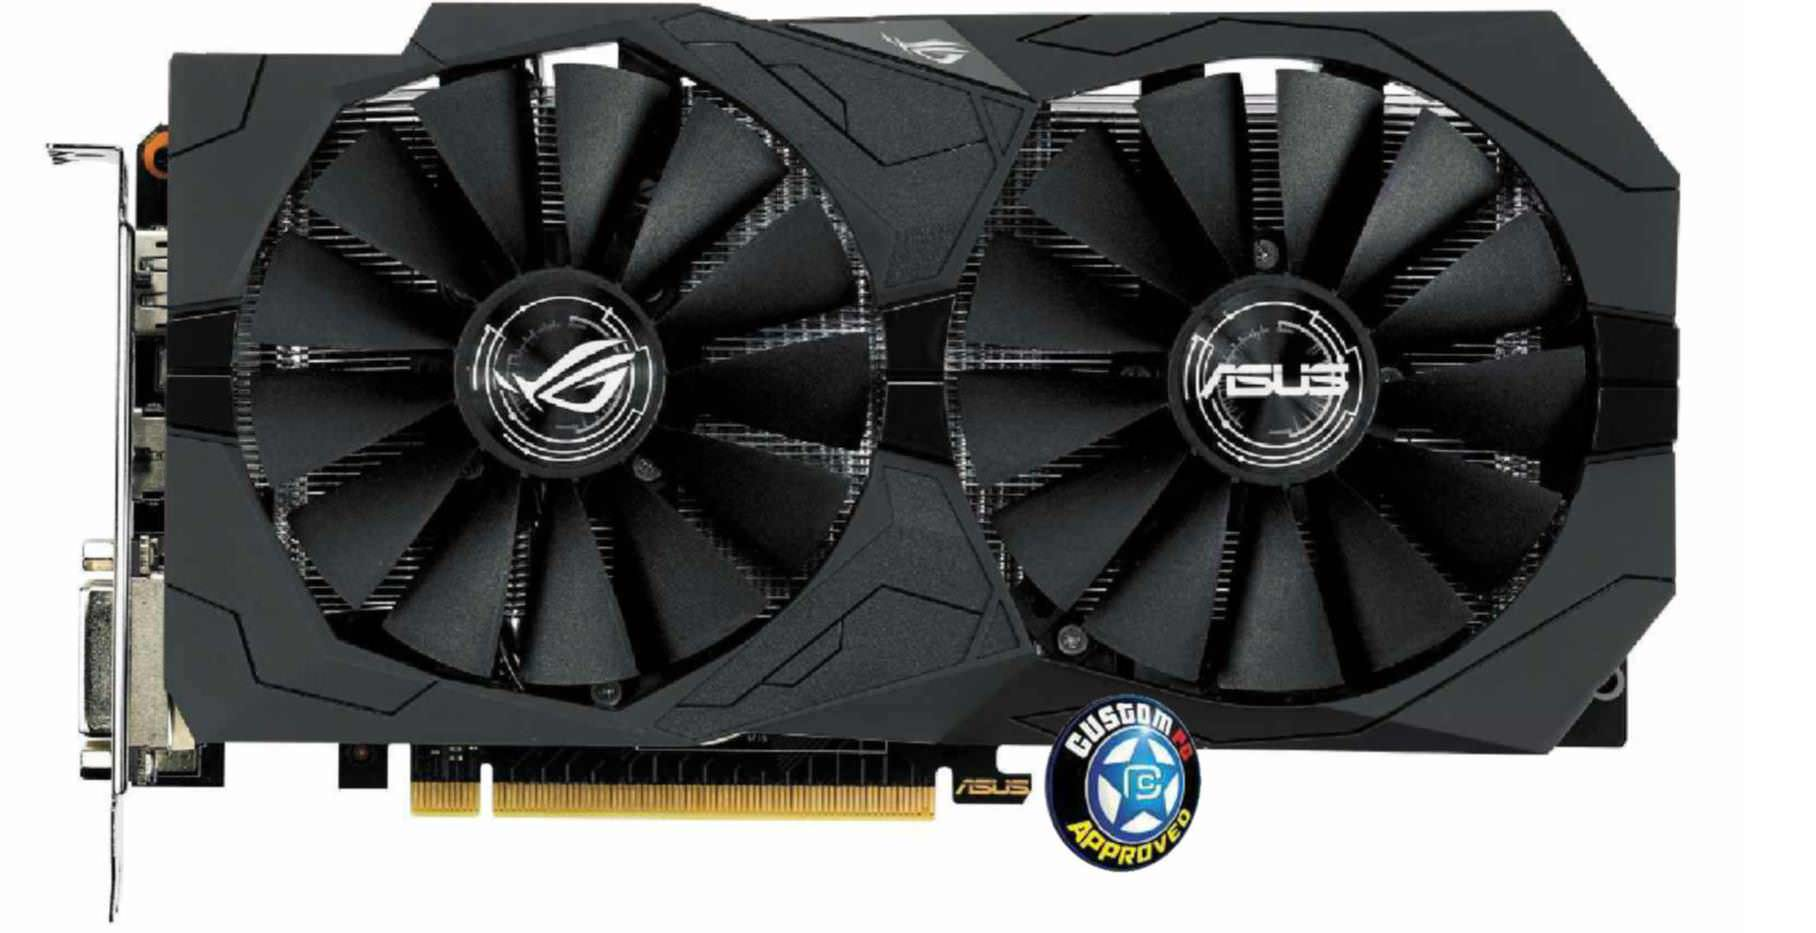 Nvidia GeForce GTX 1050 Ti 4GB